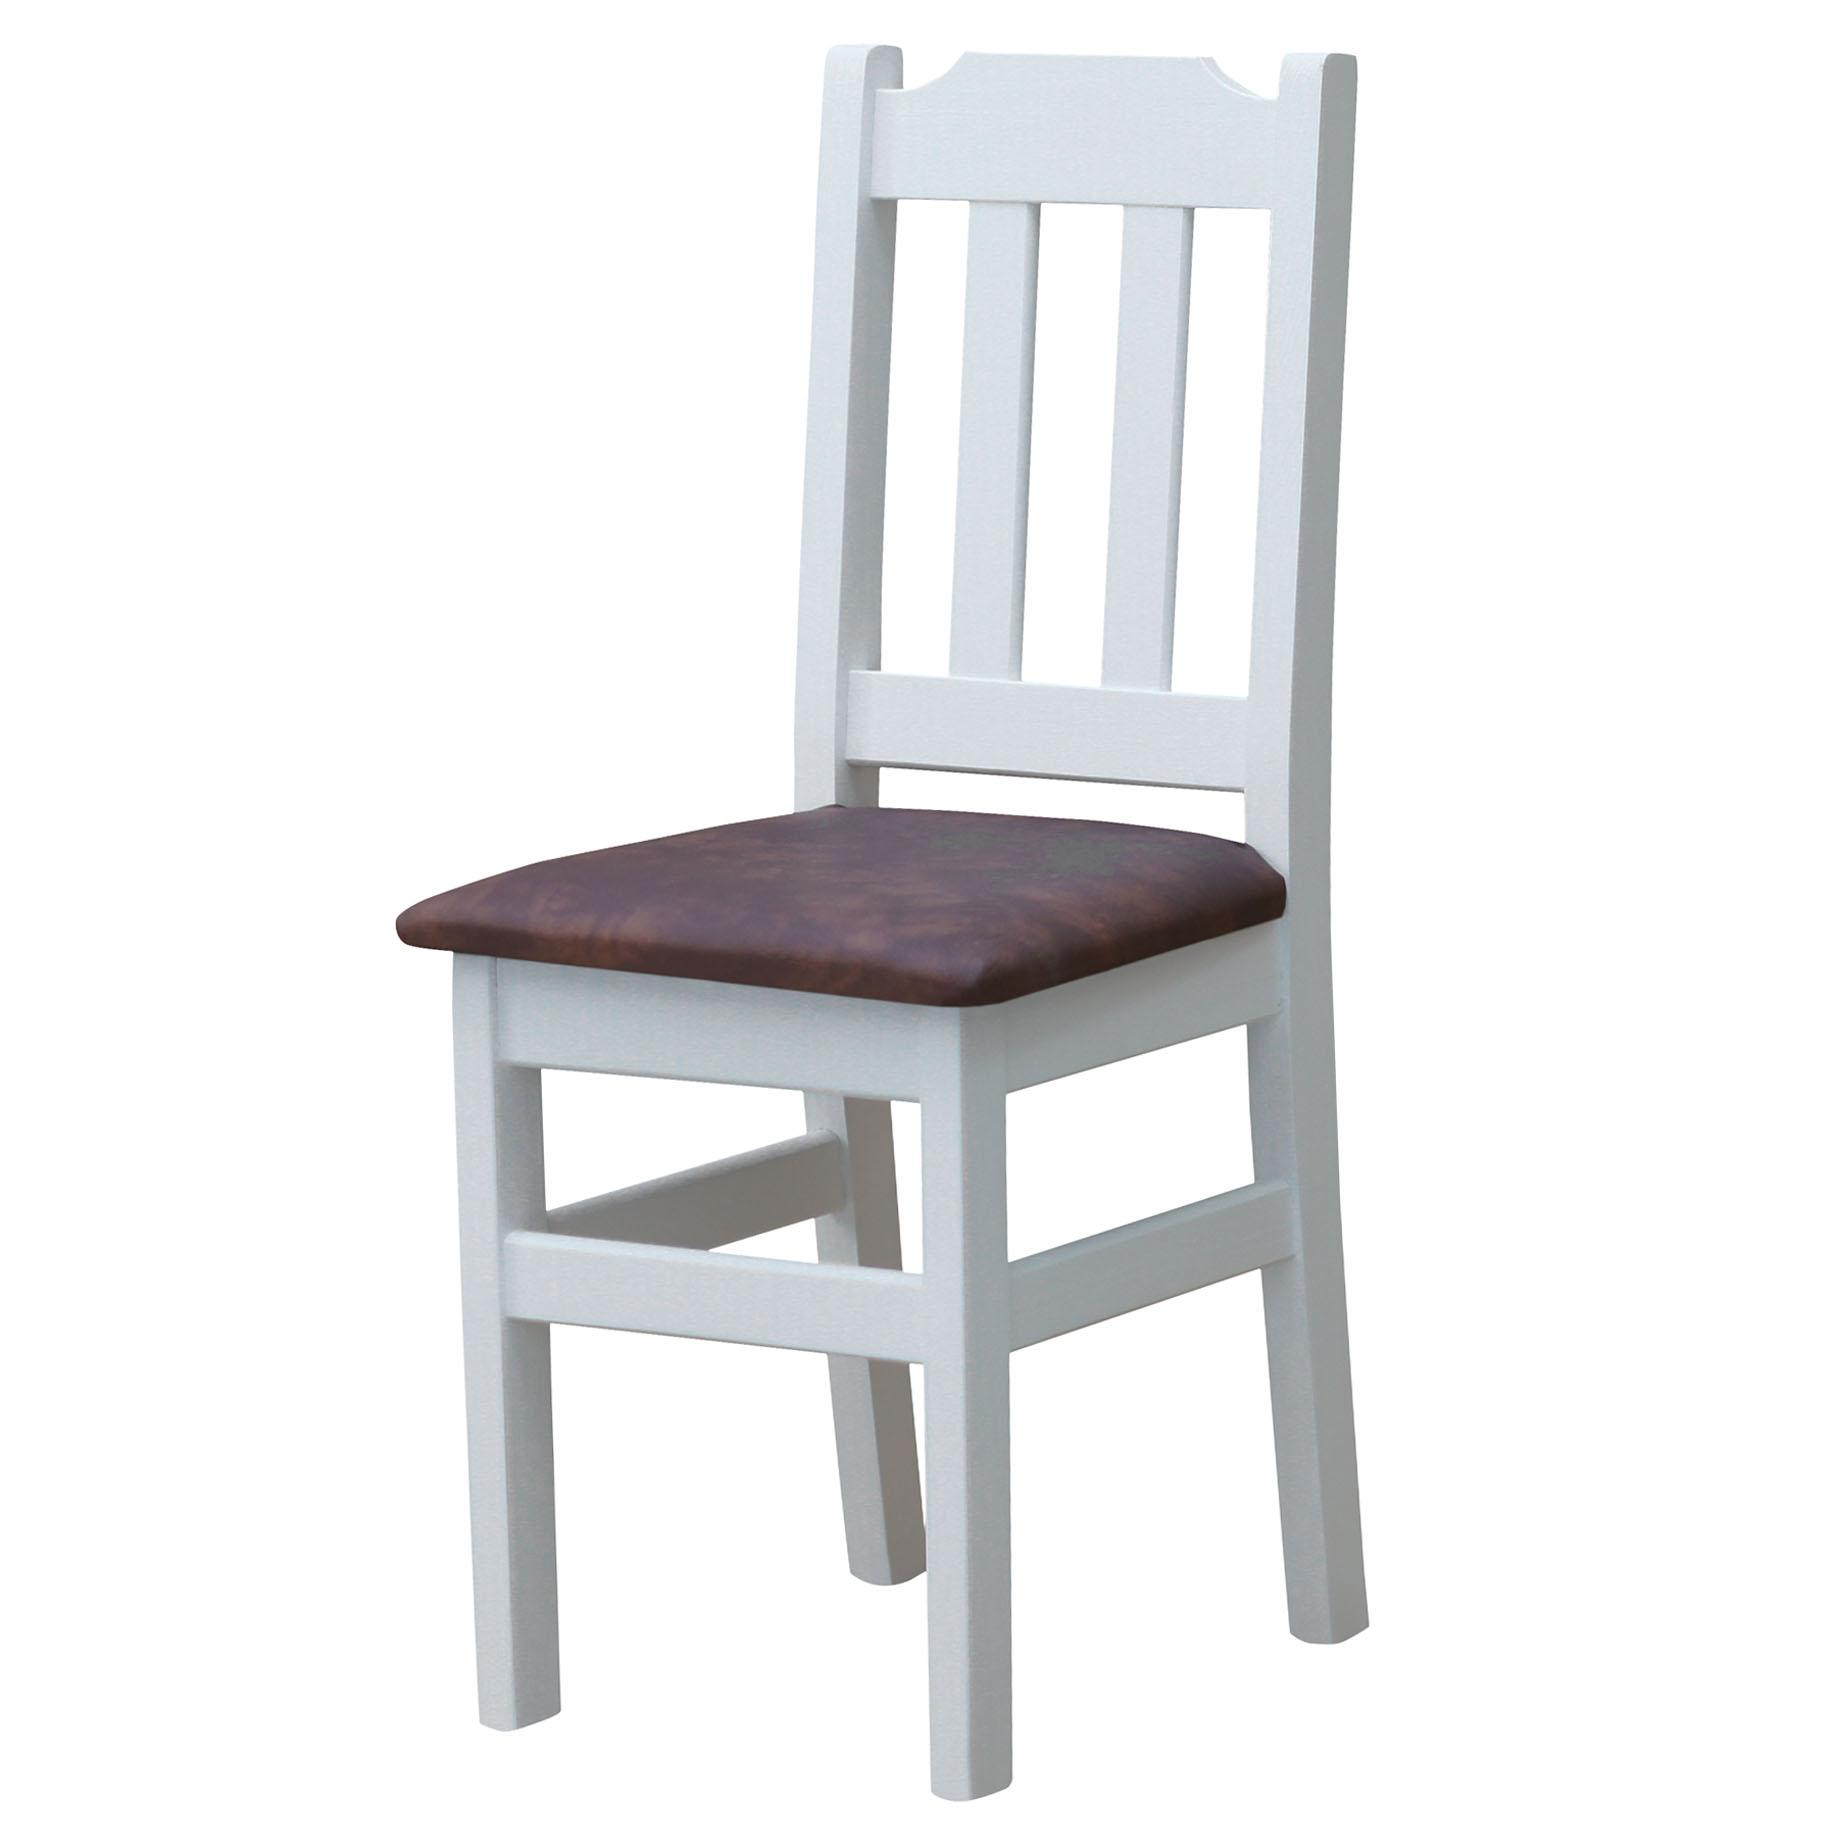 stuhl polsterstuhl weiss massiv holz neu restaurantstuhl massivholz ebay. Black Bedroom Furniture Sets. Home Design Ideas